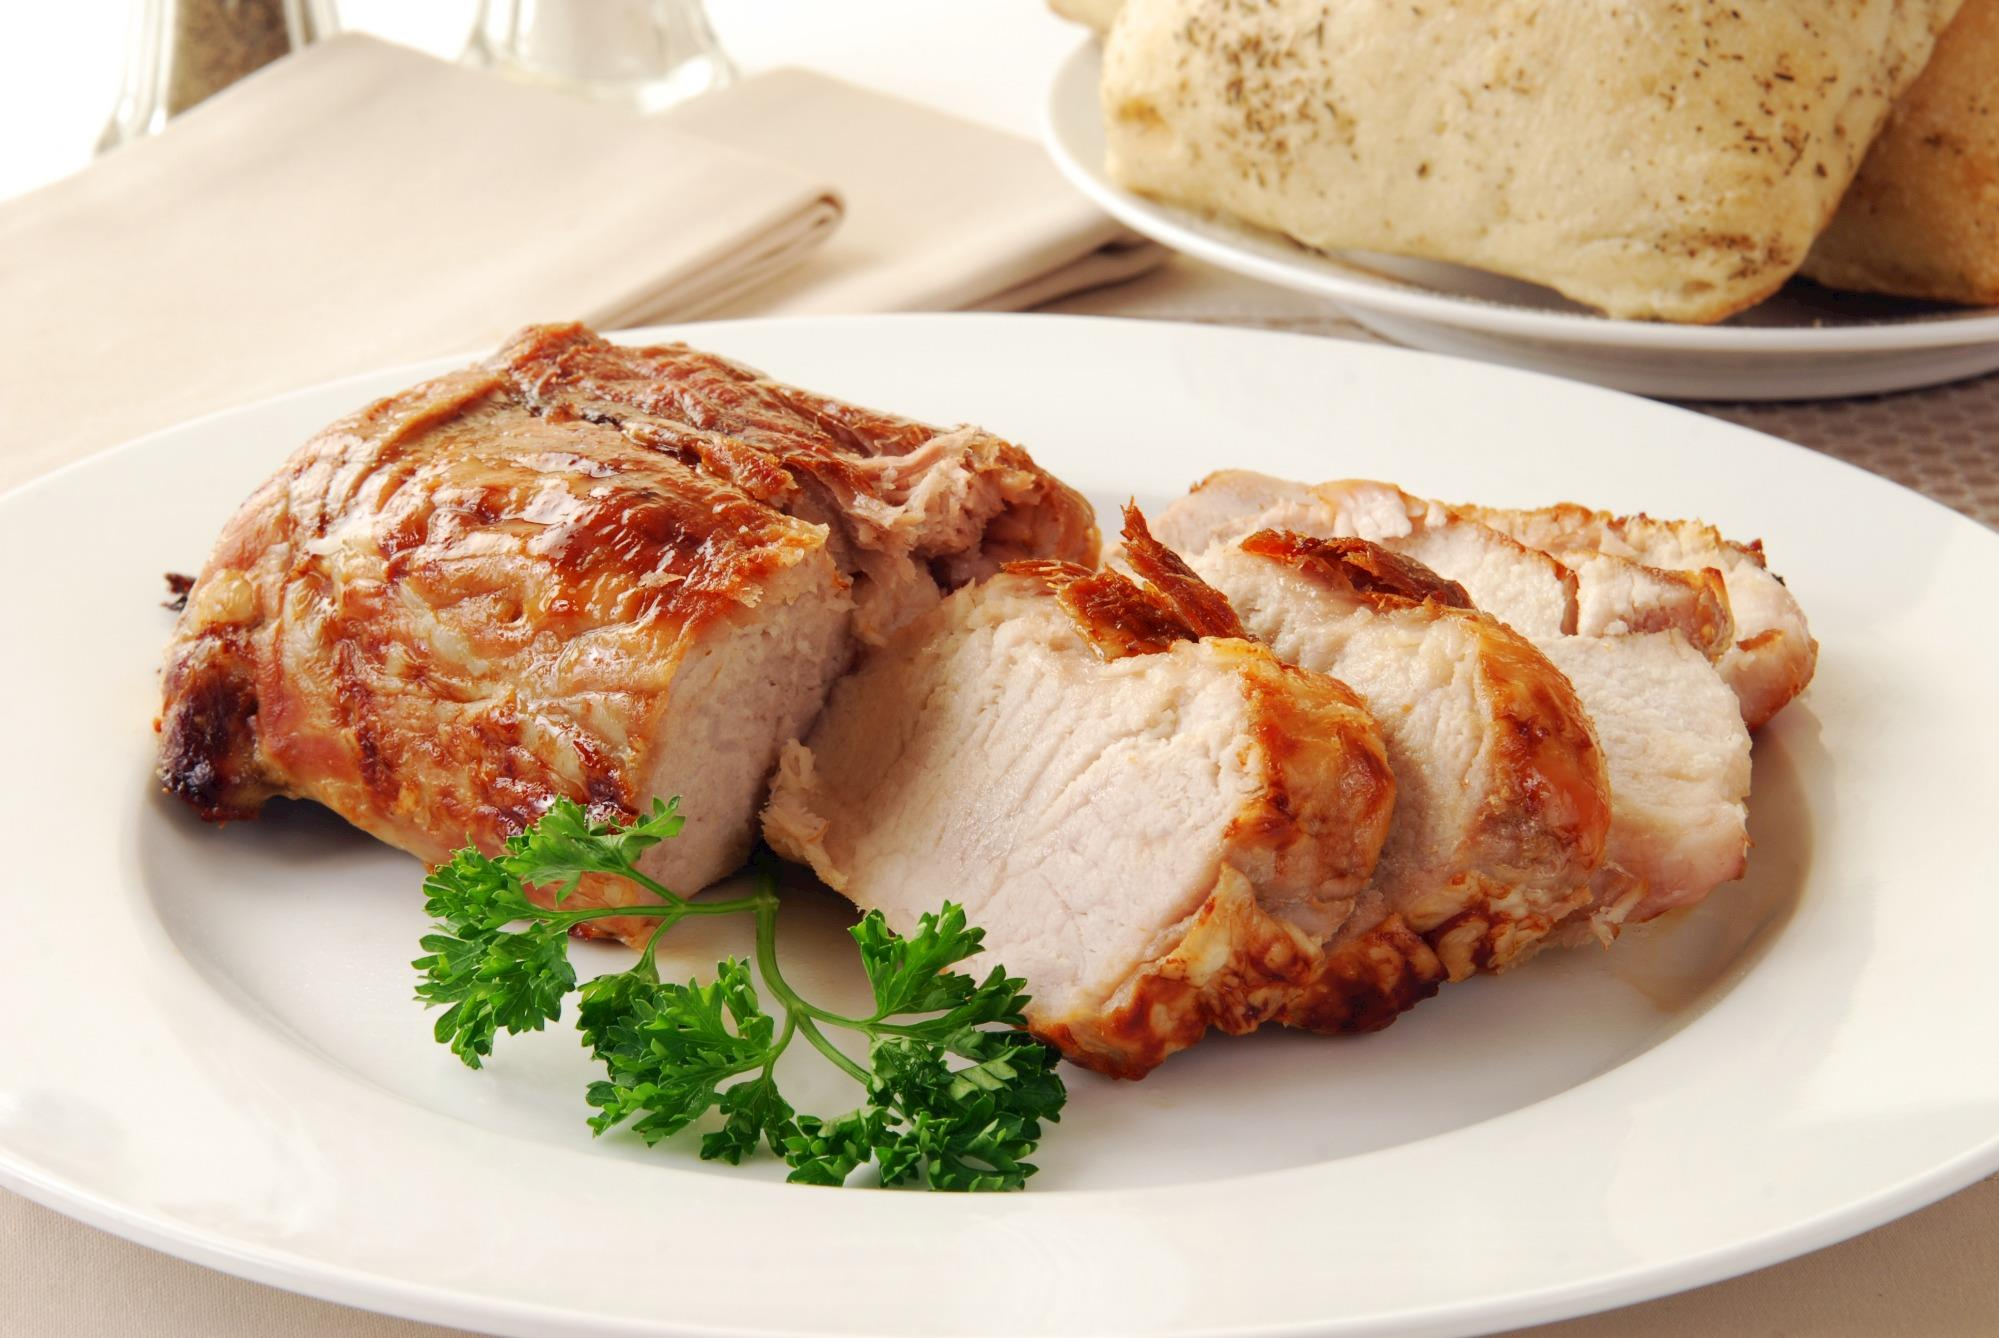 Grandes oportunidades para a carne suína crescer no varejo